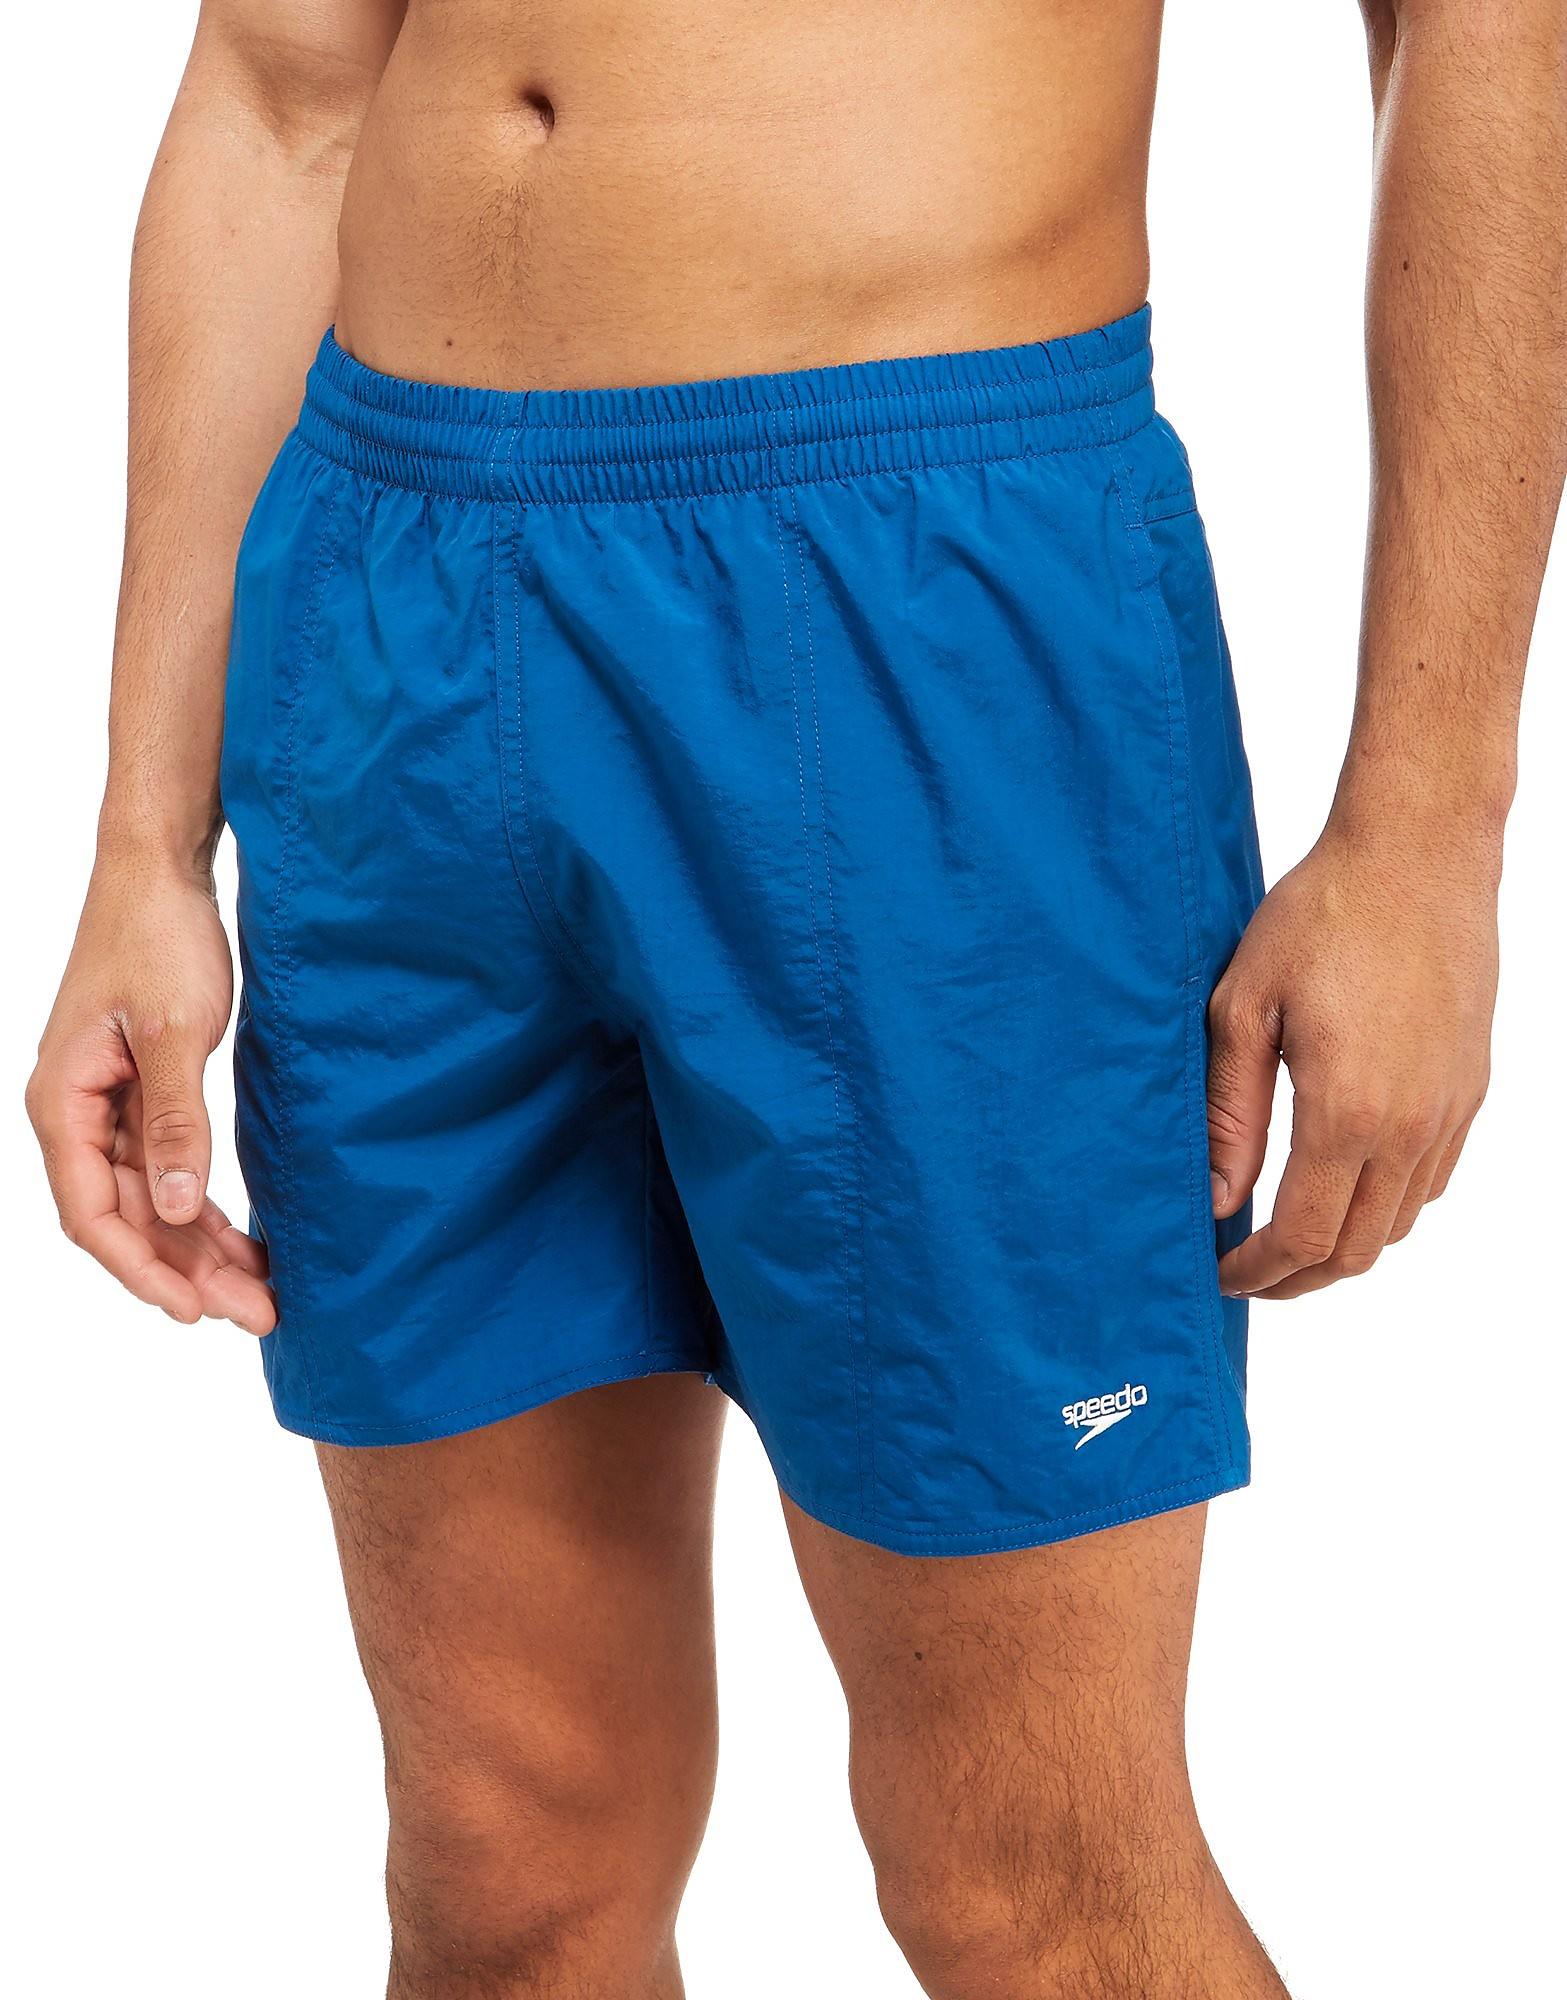 Speedo Solid Leisure Swim Shorts